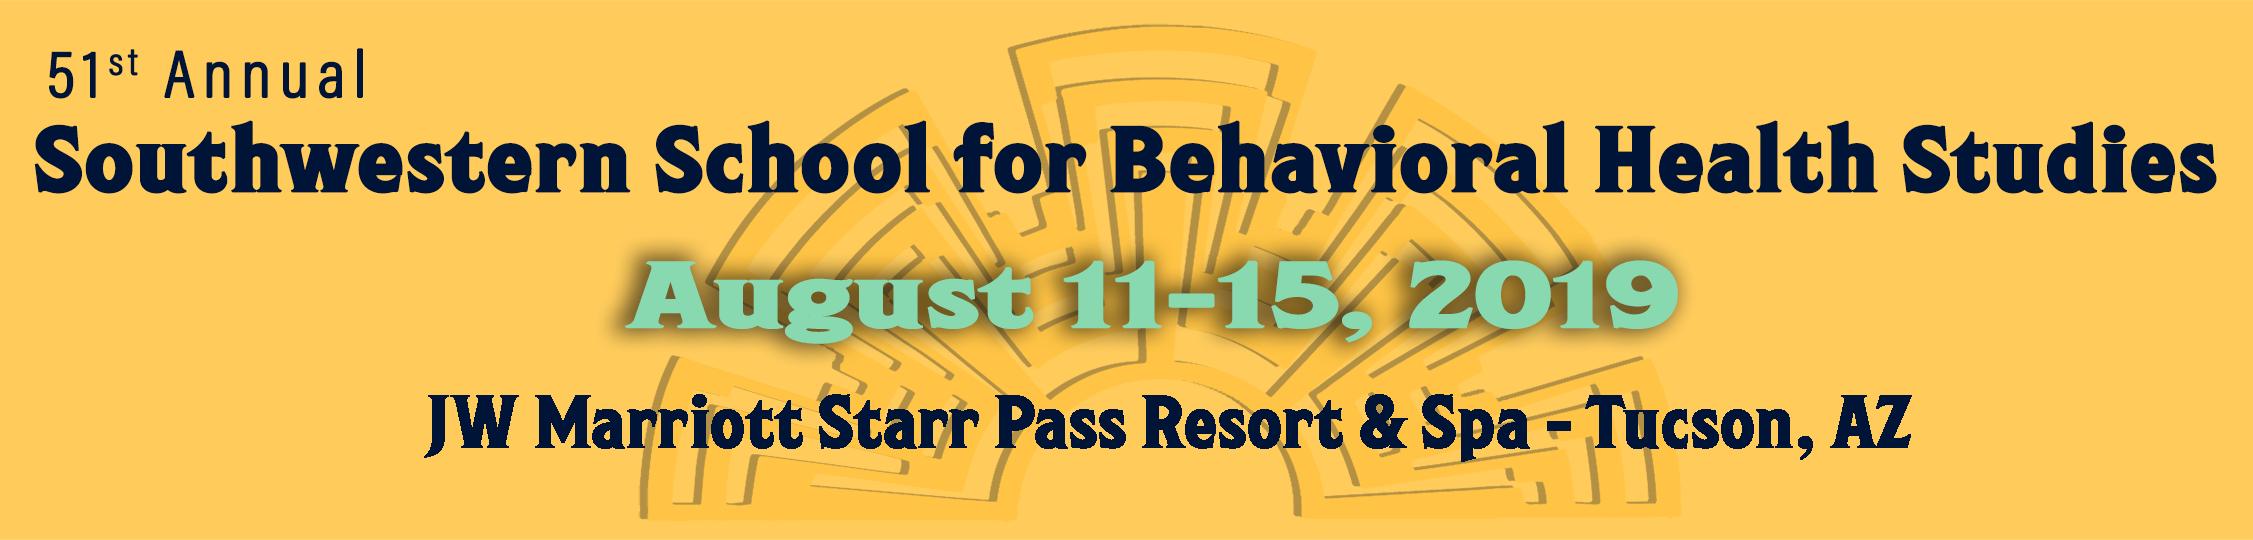 2019 Southwestern School for Behavioral Health Studies